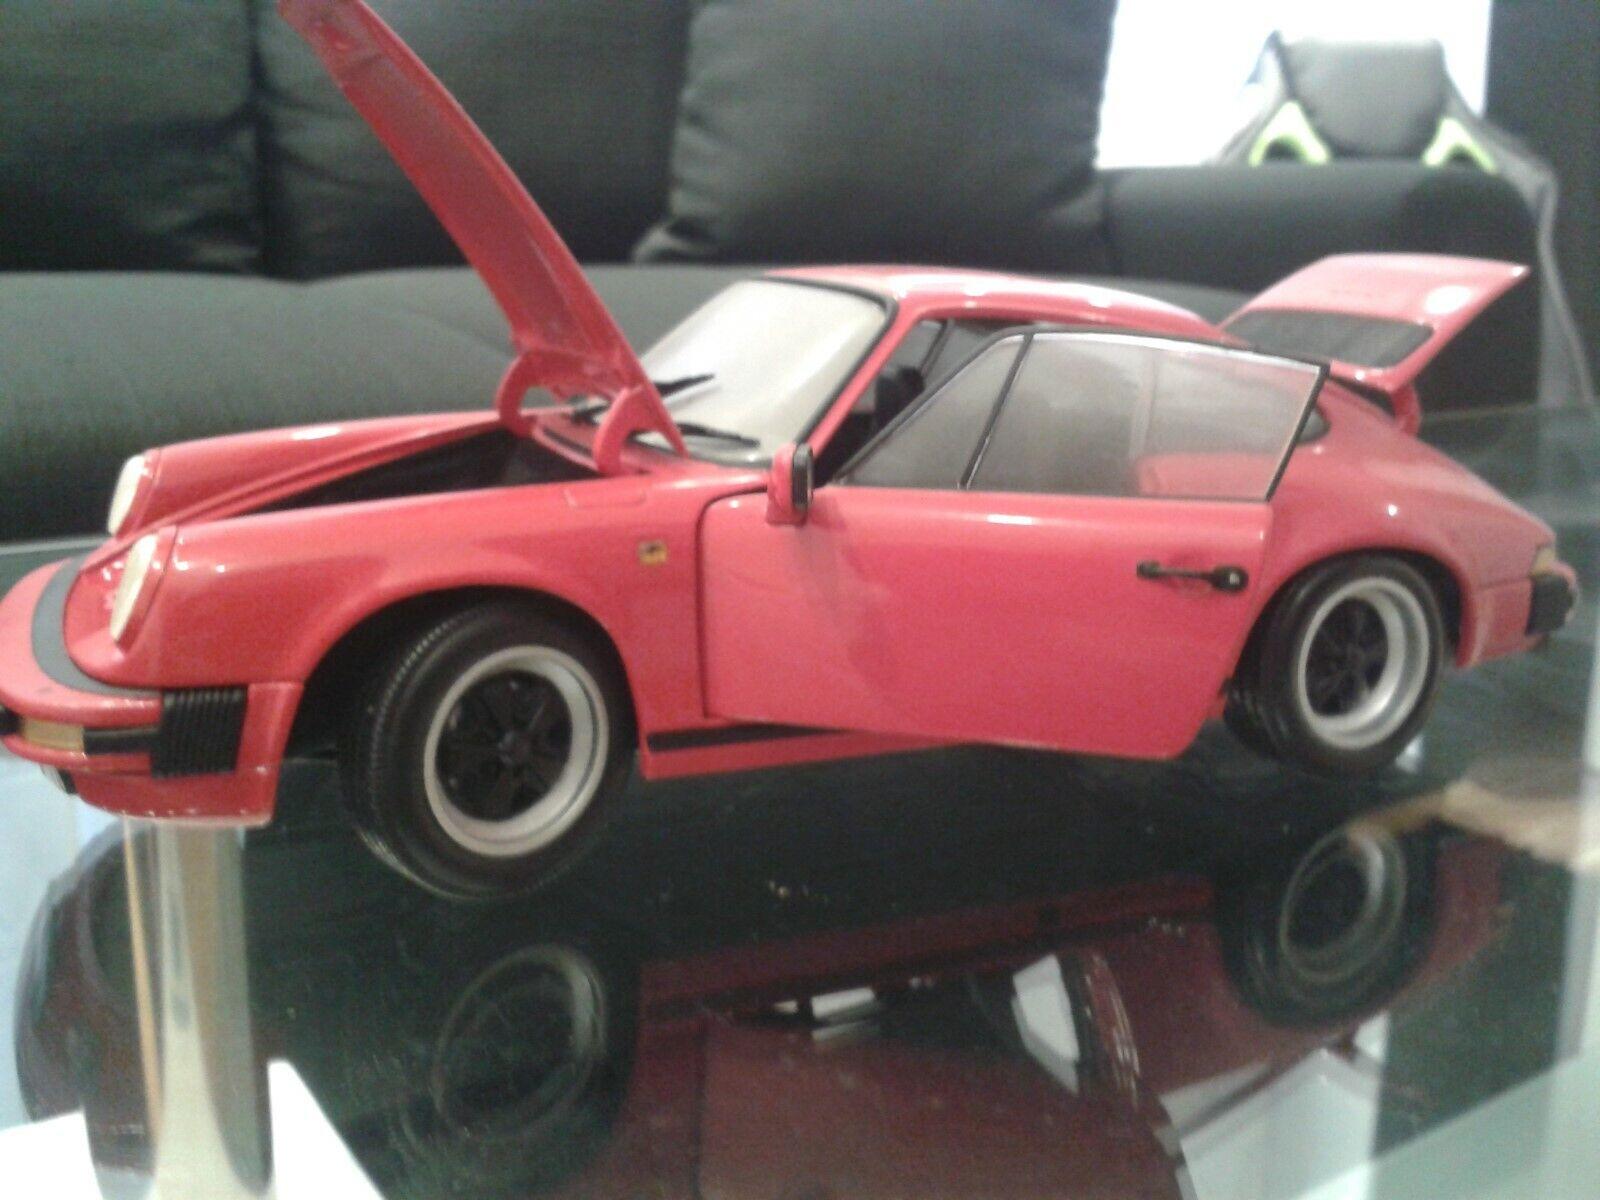 Minichamps porsche 911 carrera coupe 1 18 indischrot, vitrinenModelllll in ovp